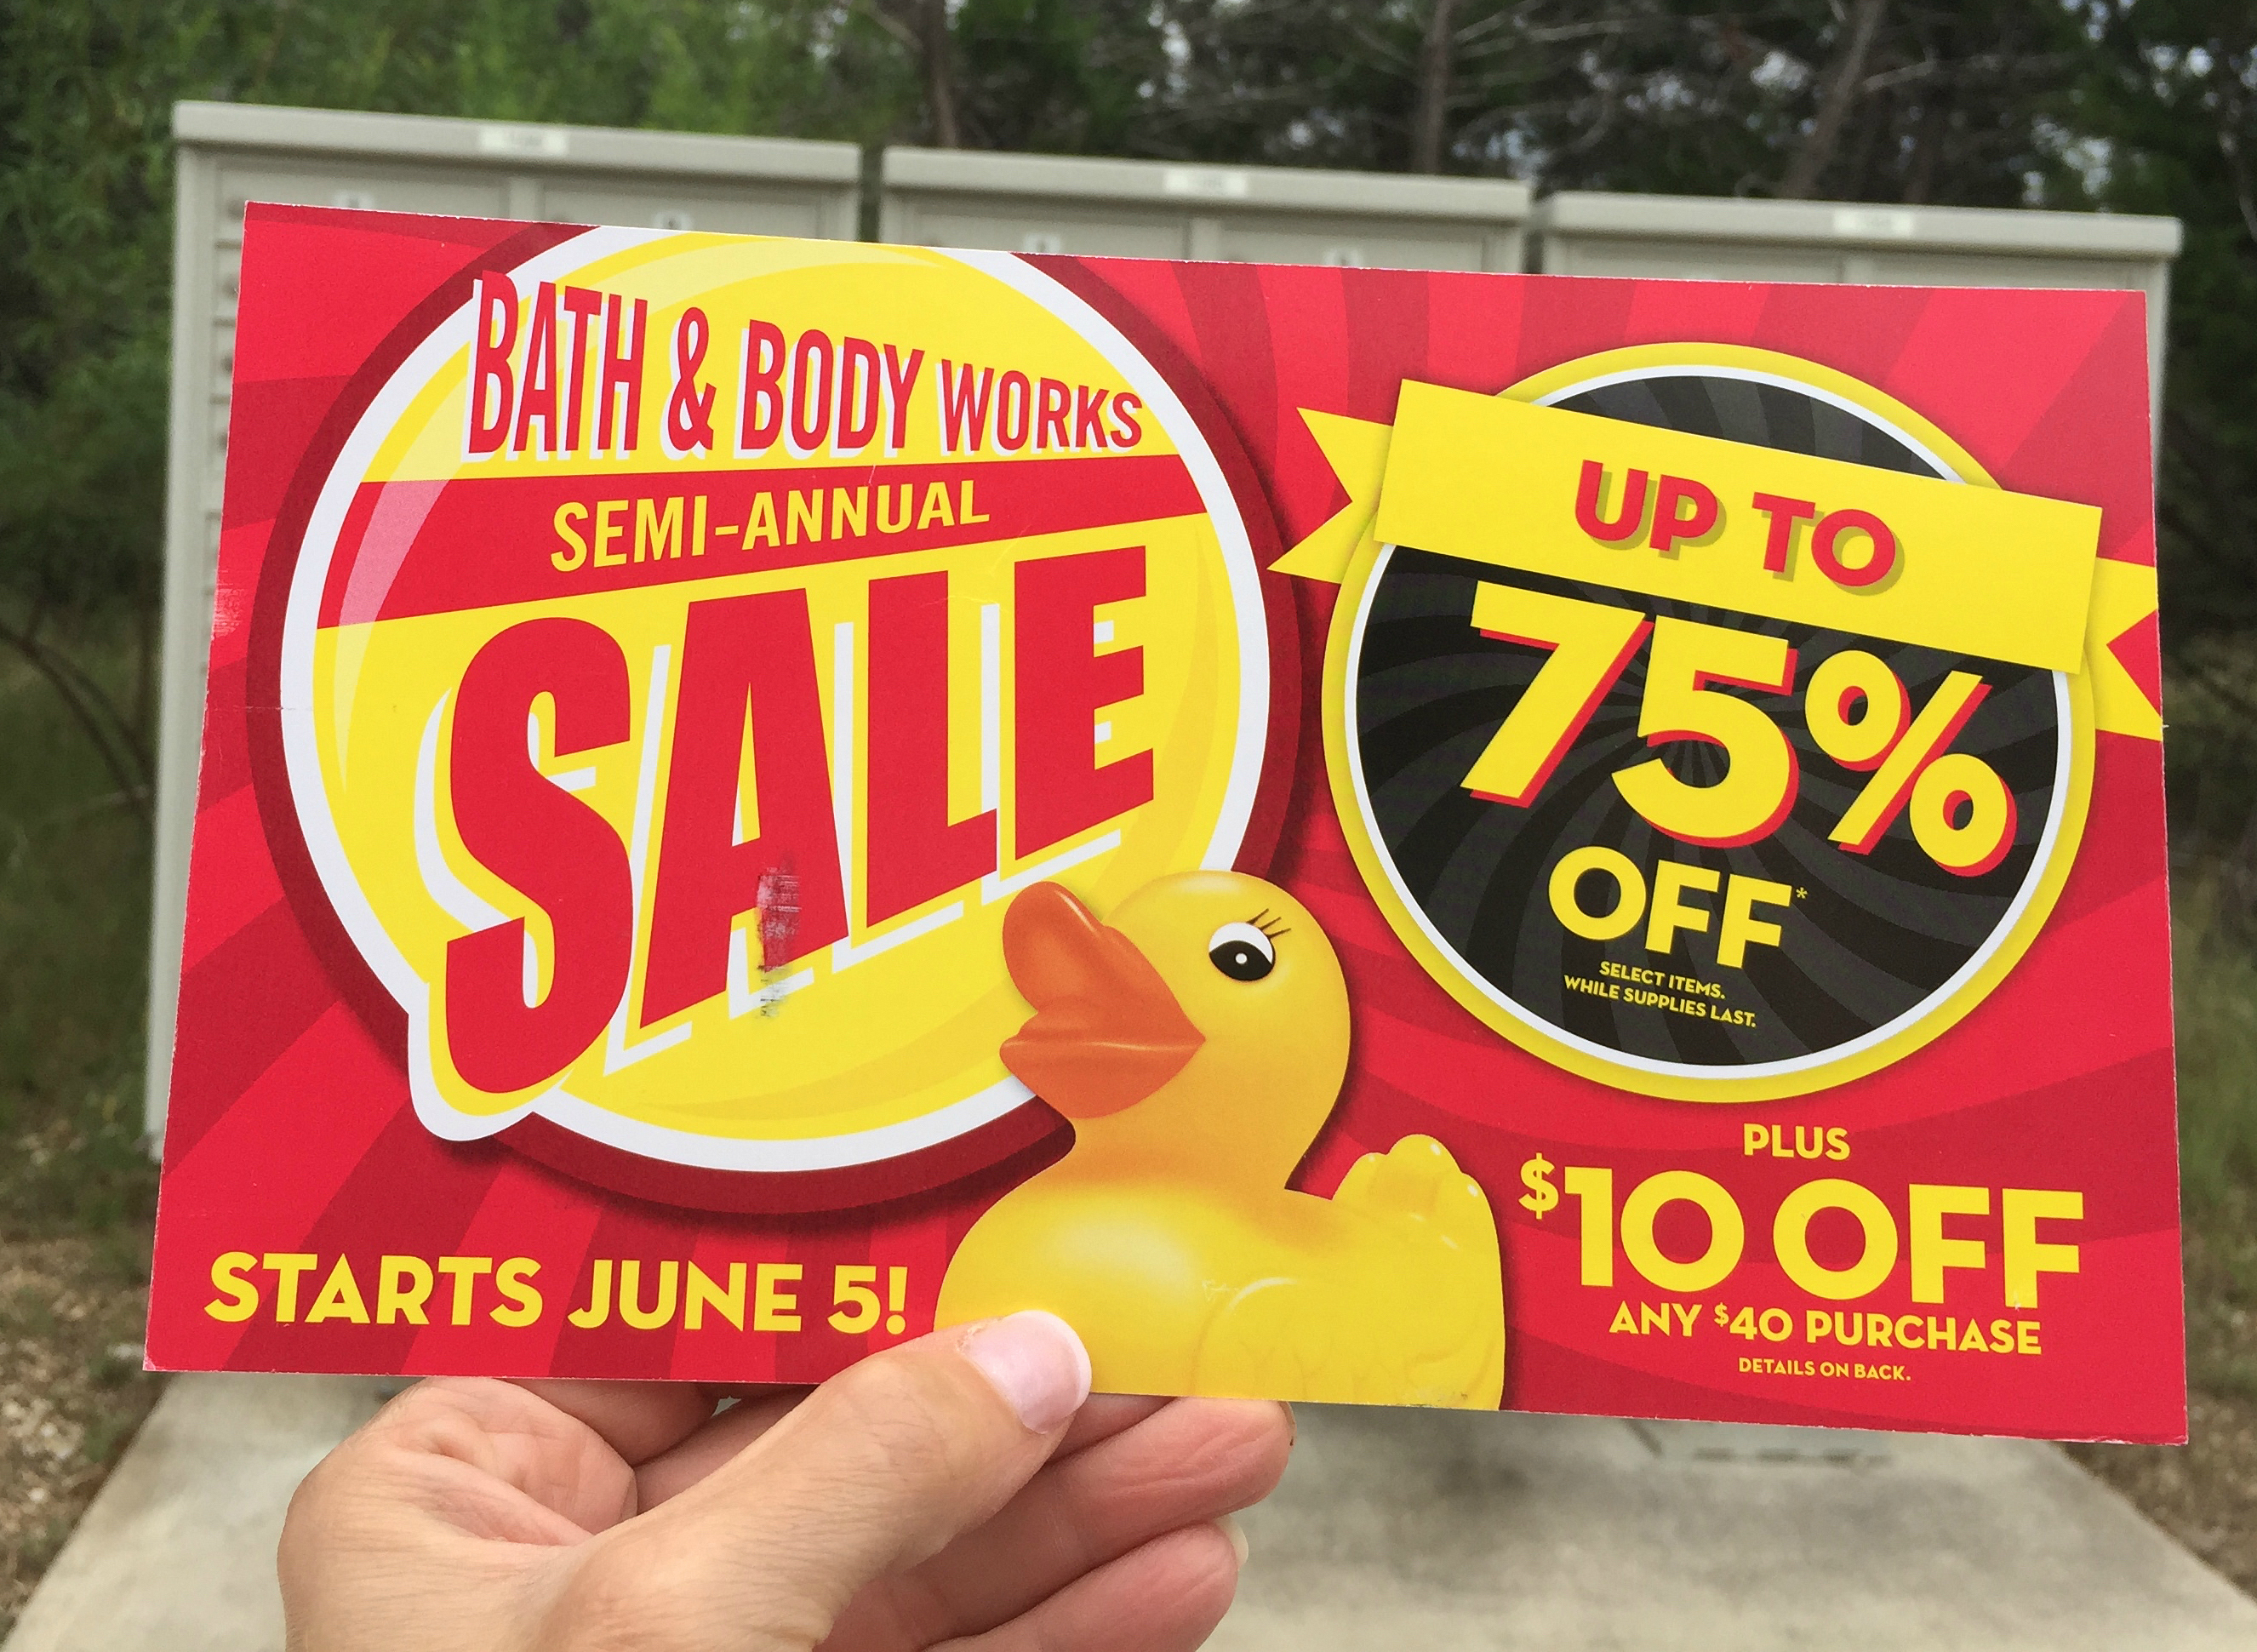 16 secrets for saving big at bath & body works – B&BW coupon